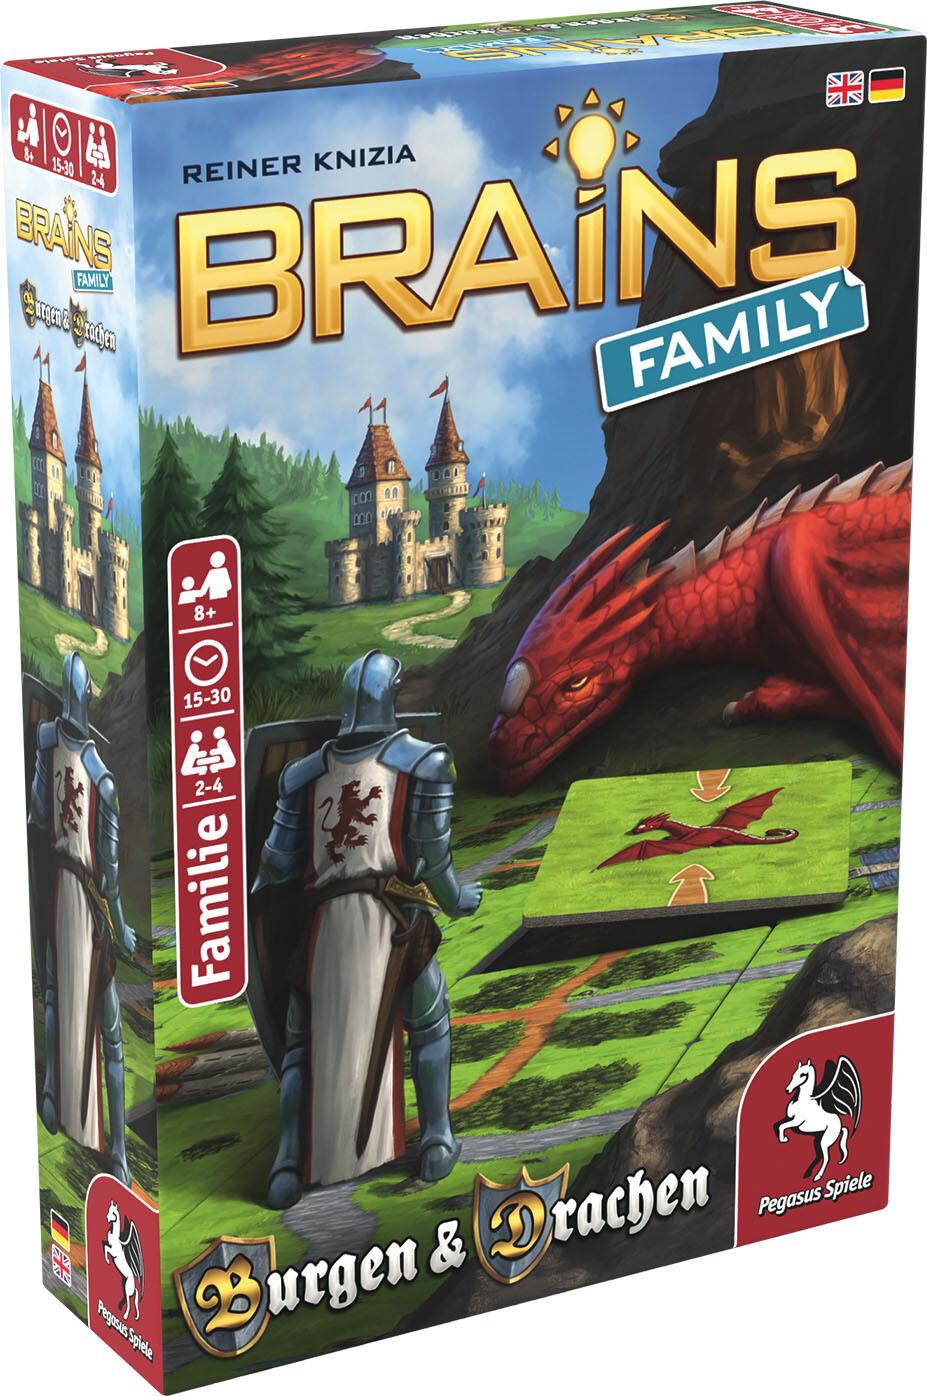 Brains Family - Castles & Dragons